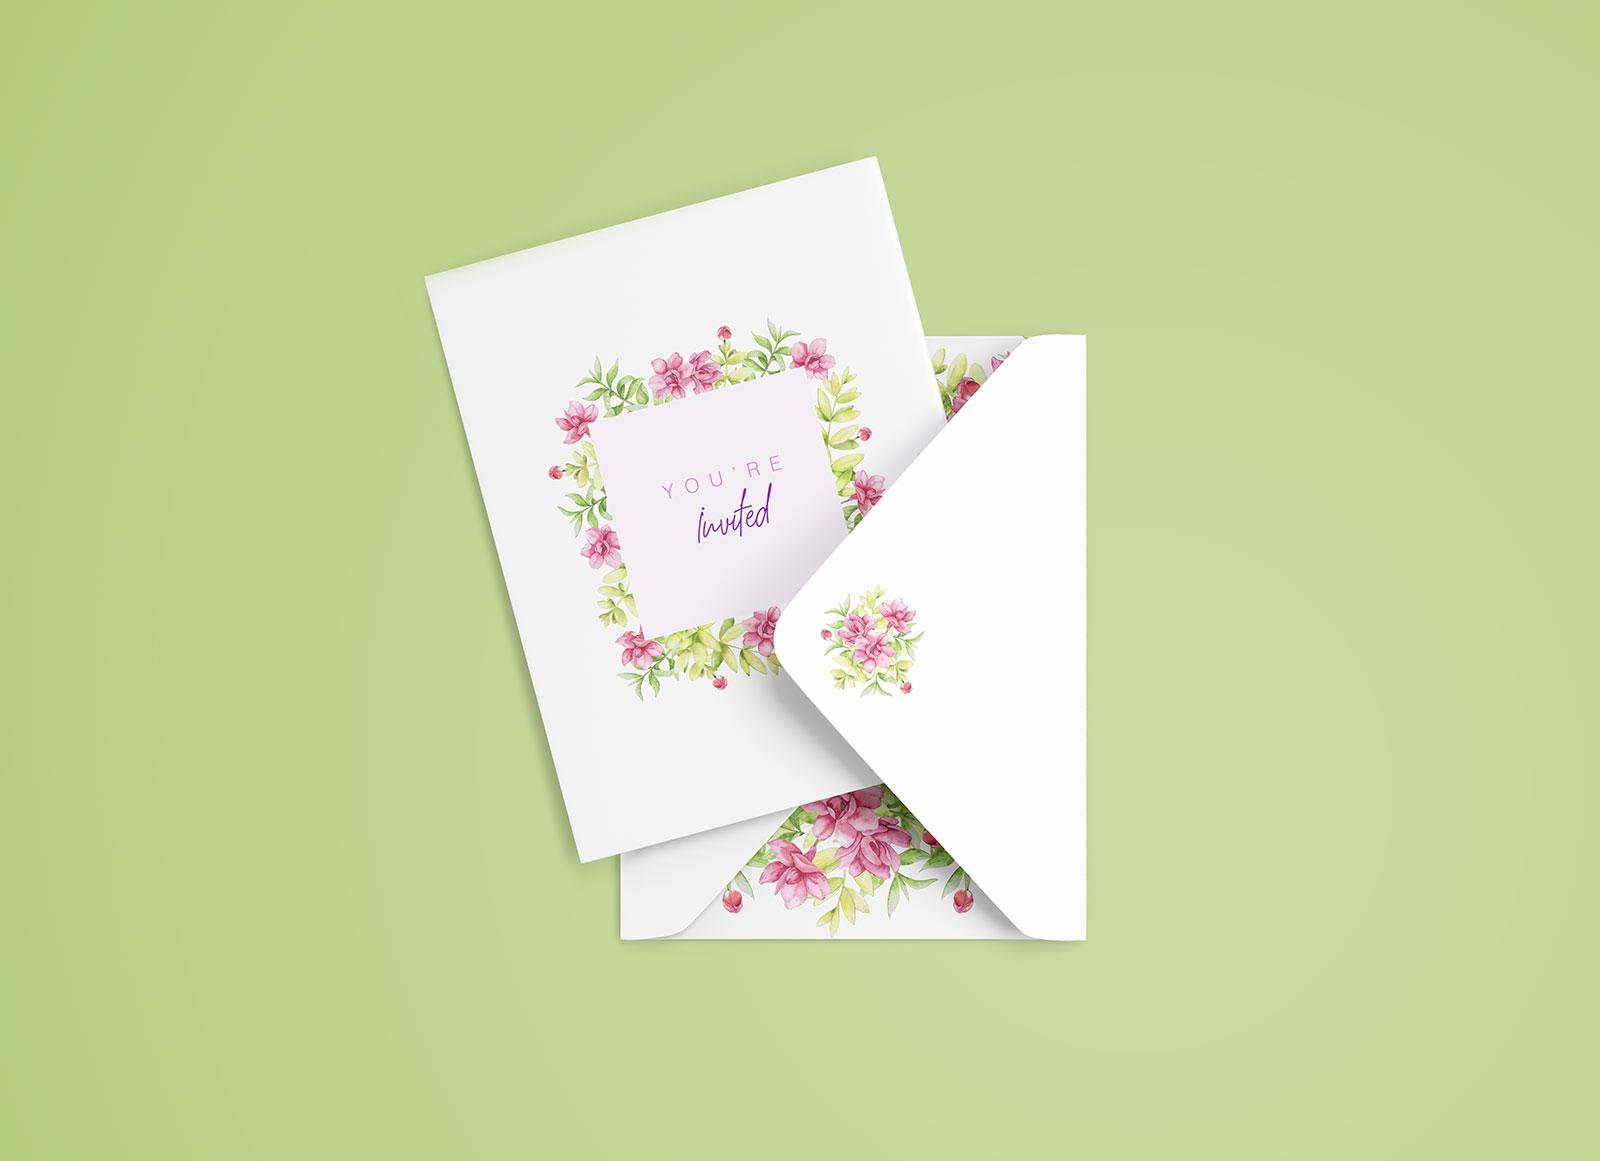 Free simple invitation card mockup psd good mockups free invitation card envelop mockup psd stopboris Images